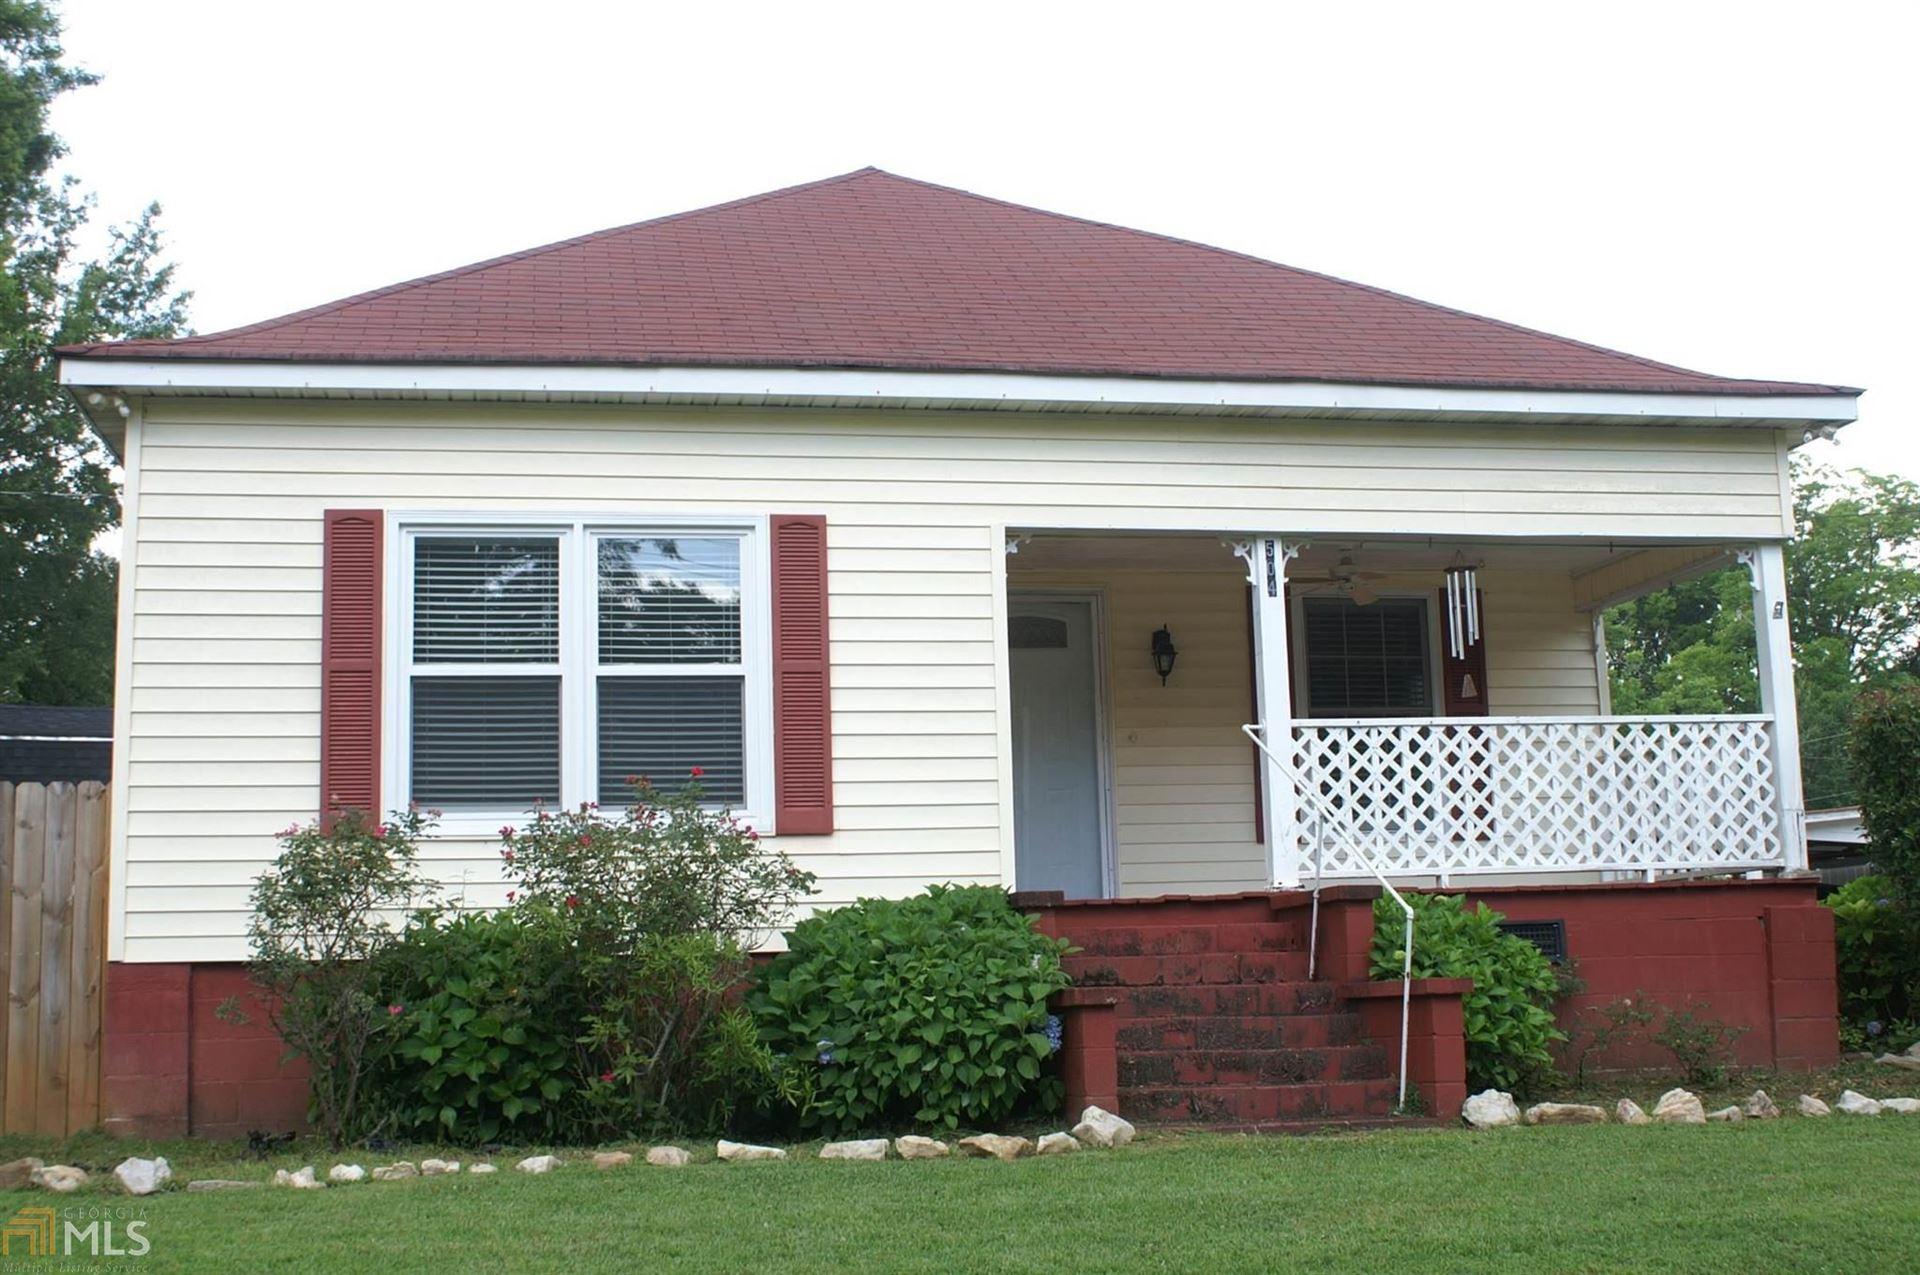 504 Crawfordville Rd, Union Point, GA 30669 - MLS#: 8995655